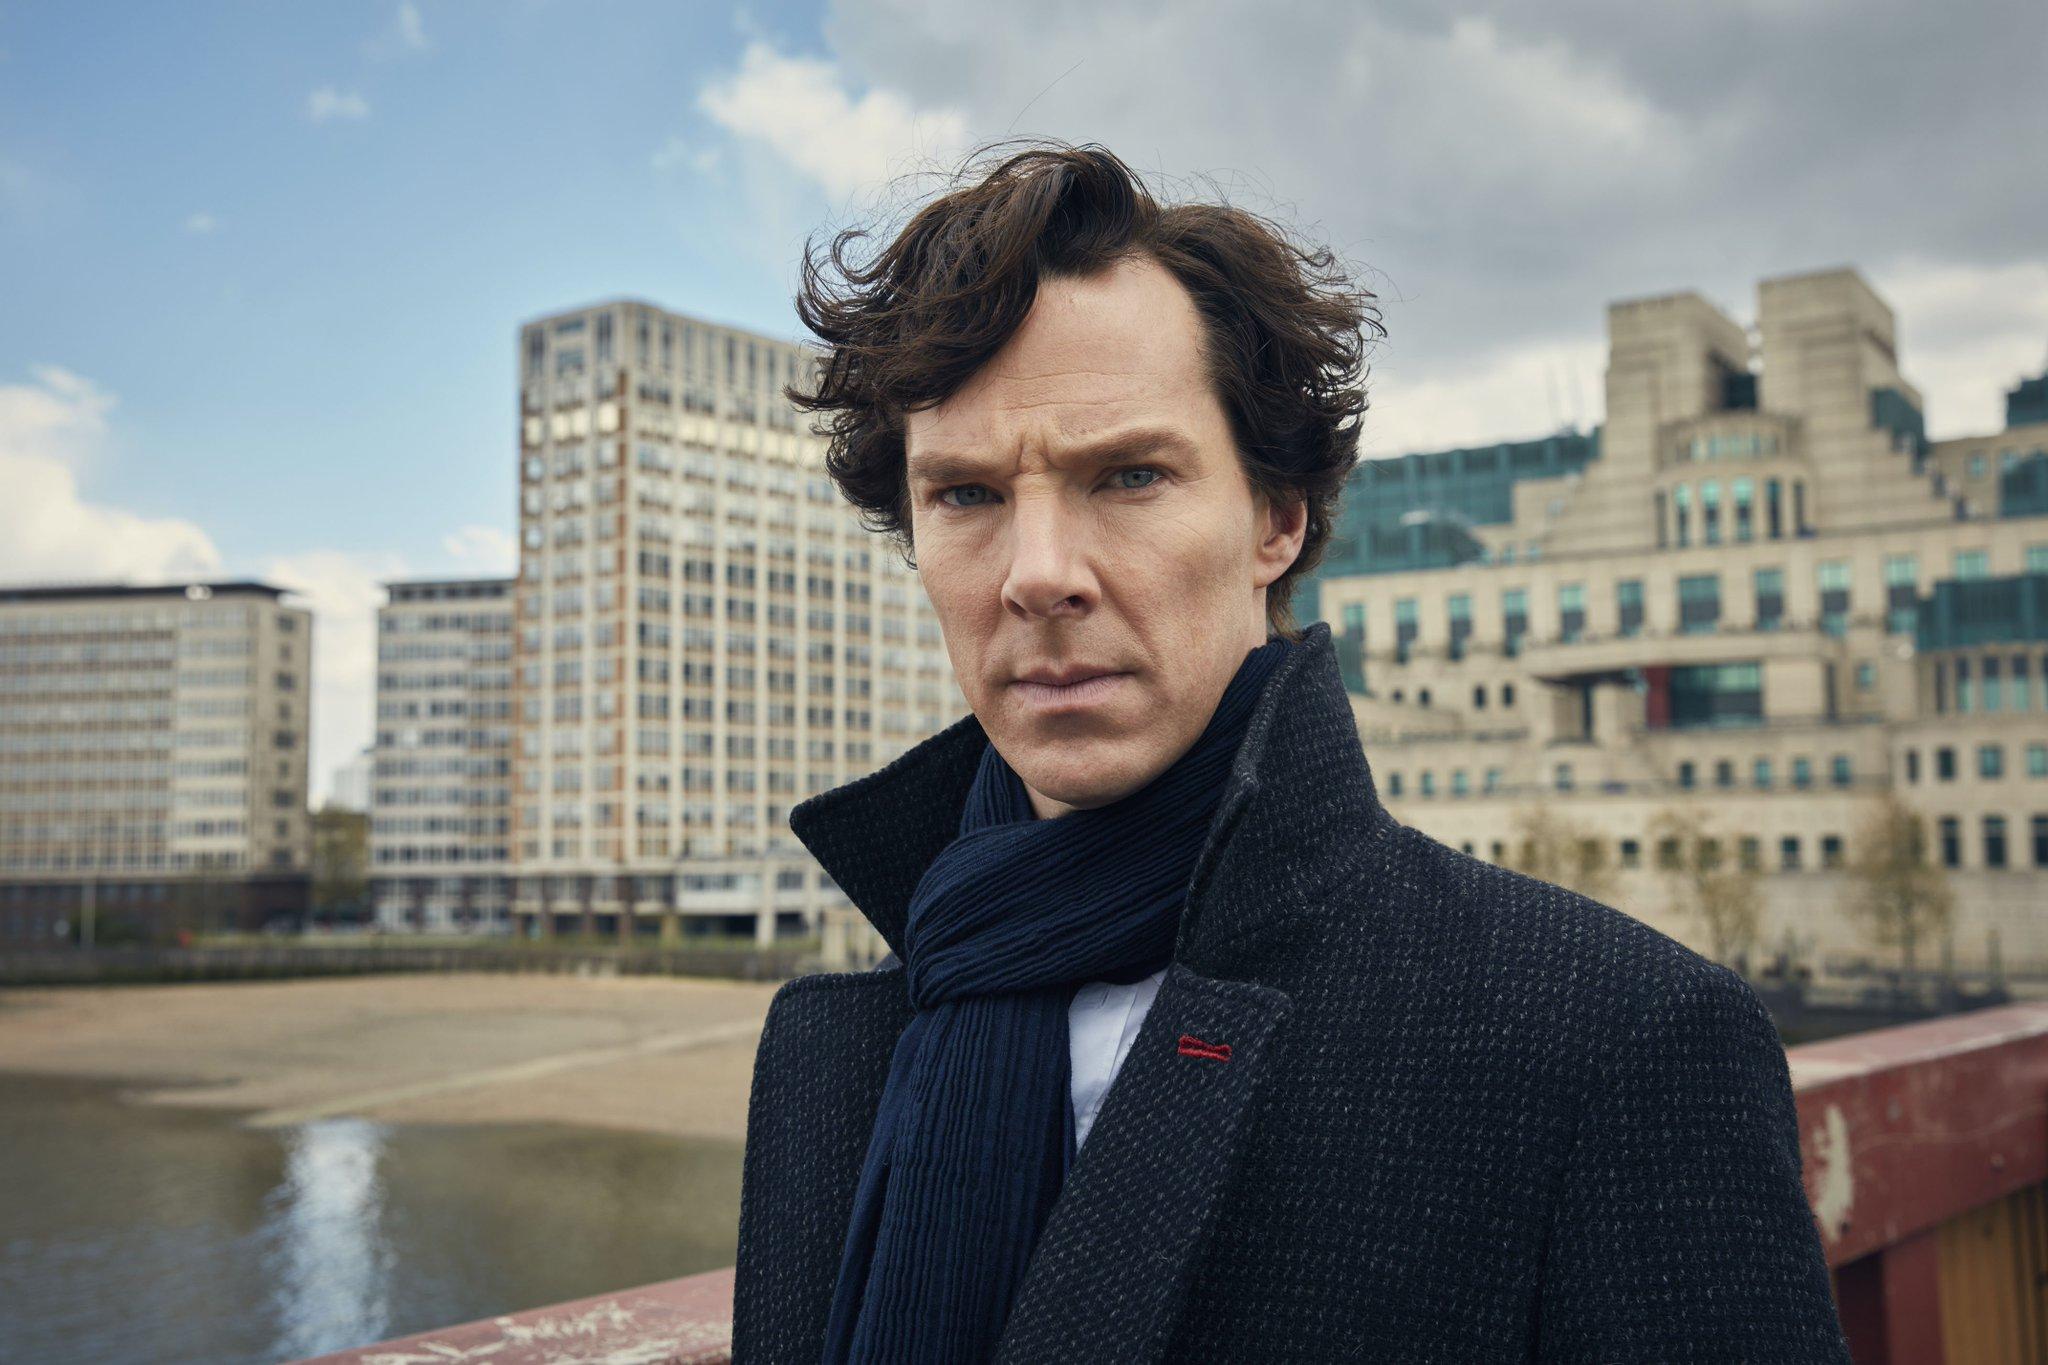 UK: 30 MINUTE ALERT! #Sherlock S4E1 The Six Thatchers airs on @BBCOne in a mere 30 minutes at 20:30GMT! @Sherlock221B #221BringIt https://t.co/gOLF9dY0NN